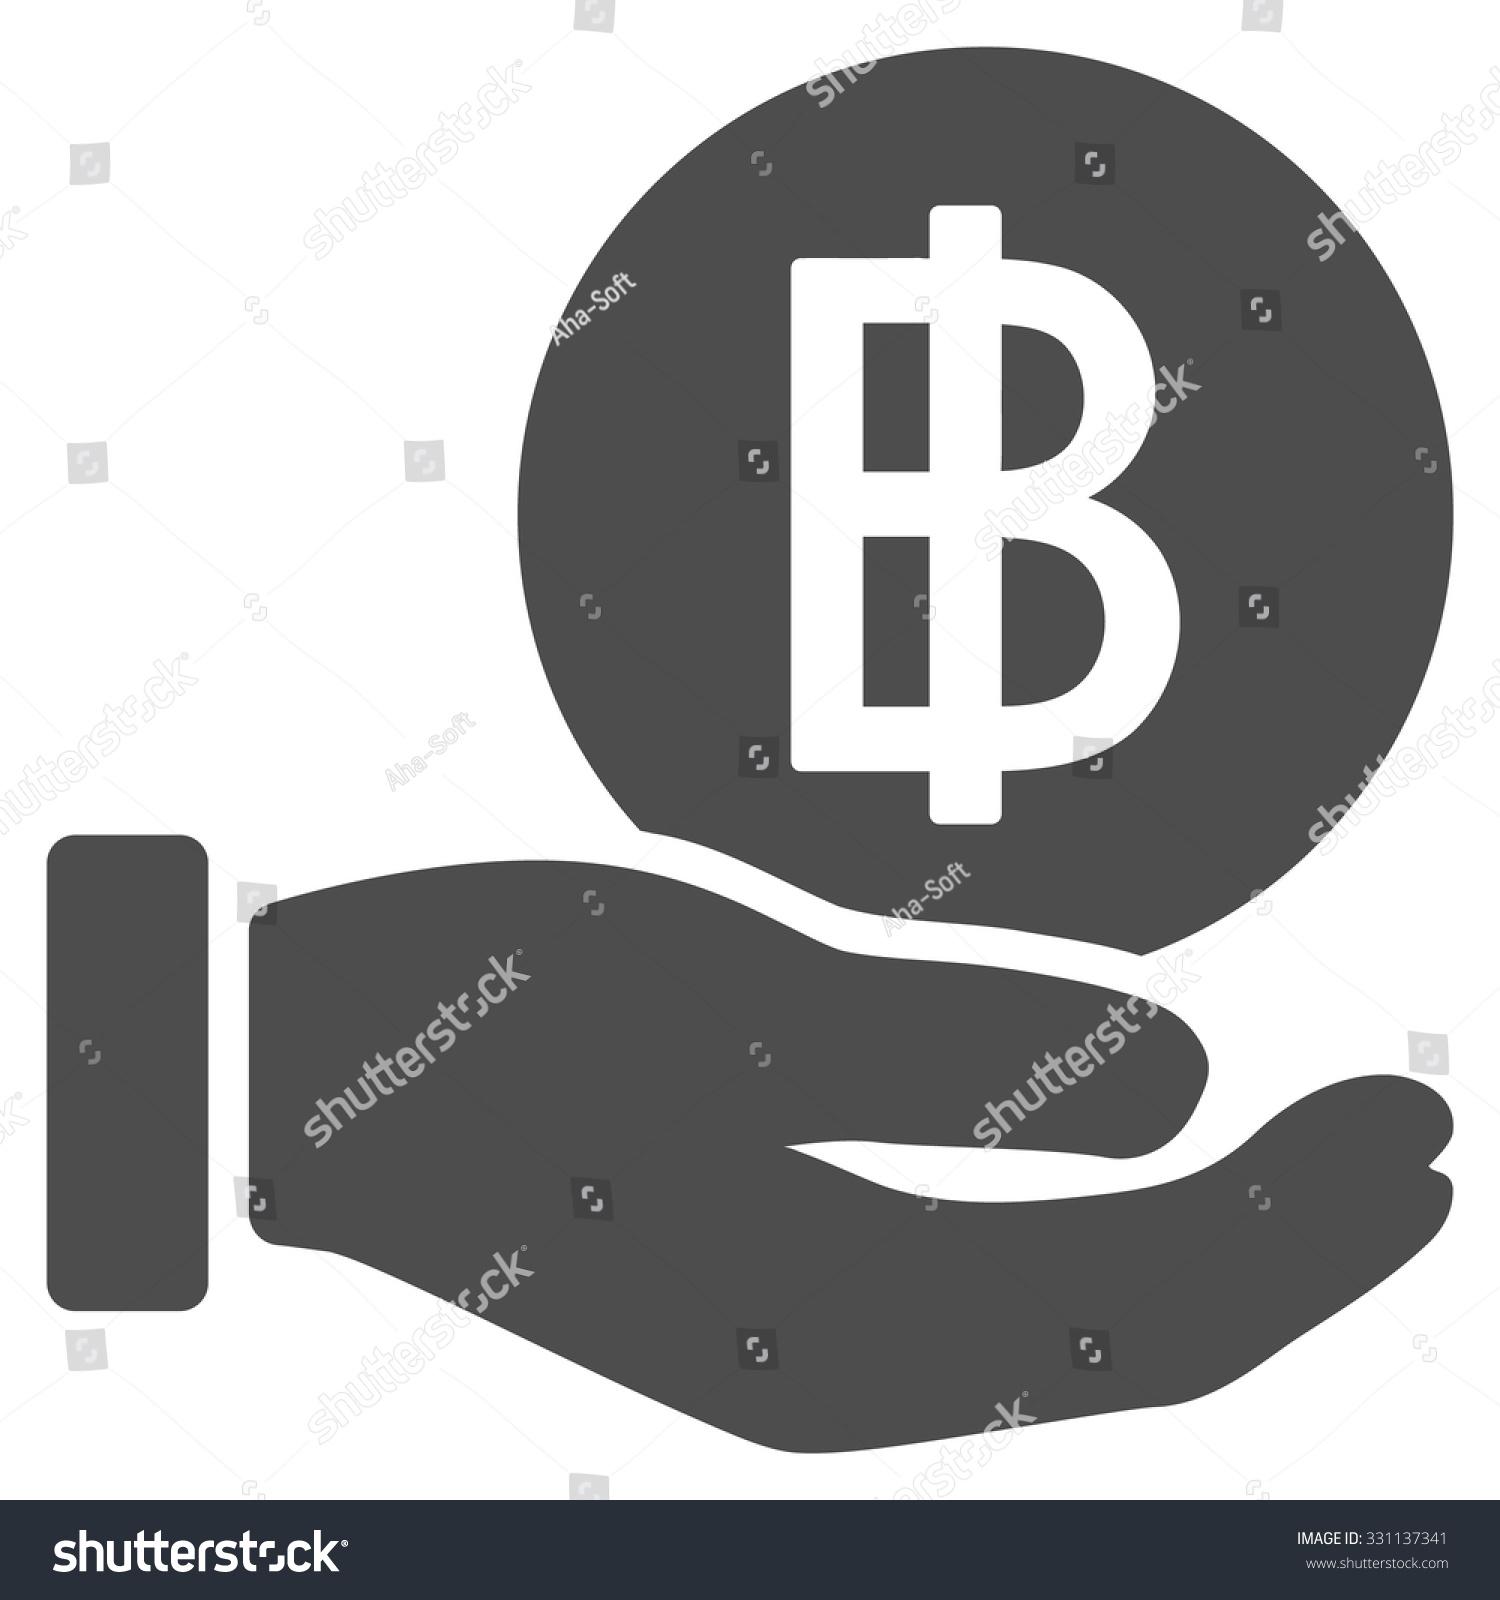 Thai Baht Coin Payment Vector Icon Stock Vector 331137341 Shutterstock